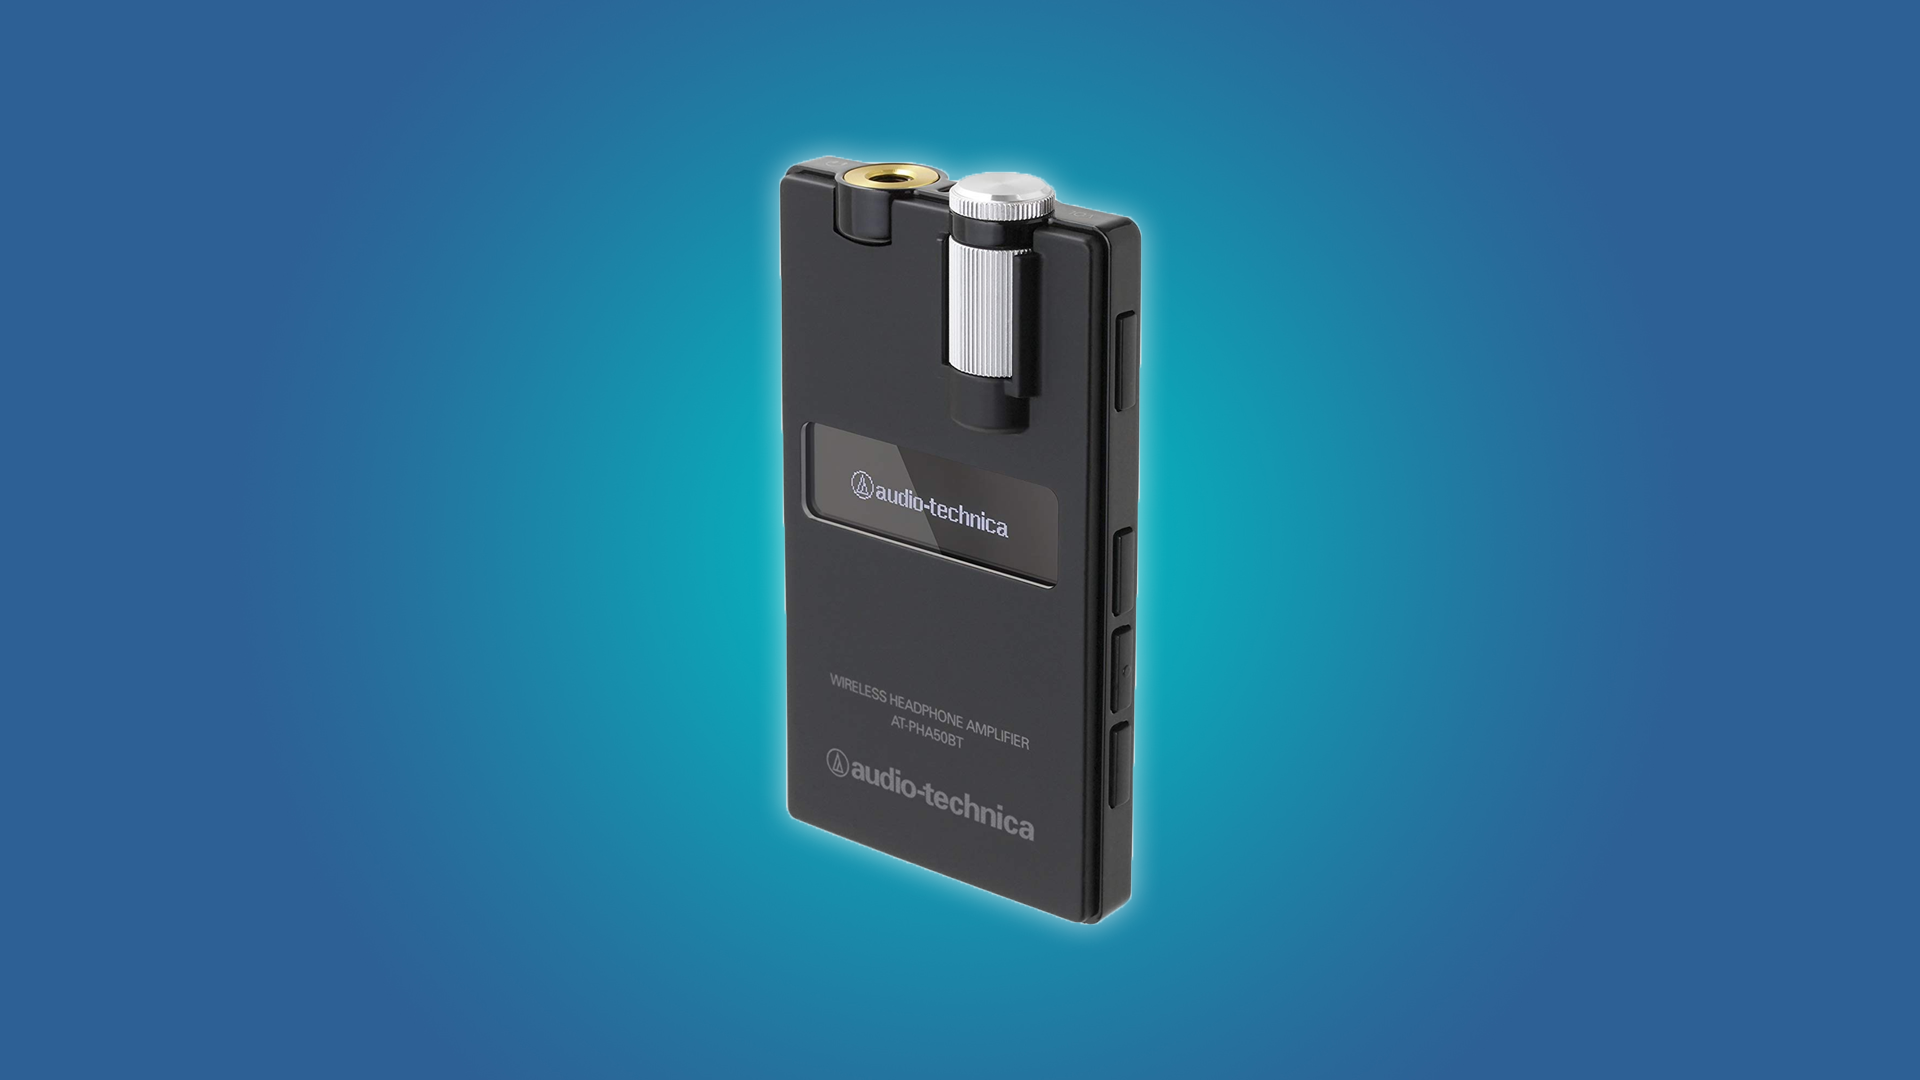 The Audio-Technica Wireless DAC